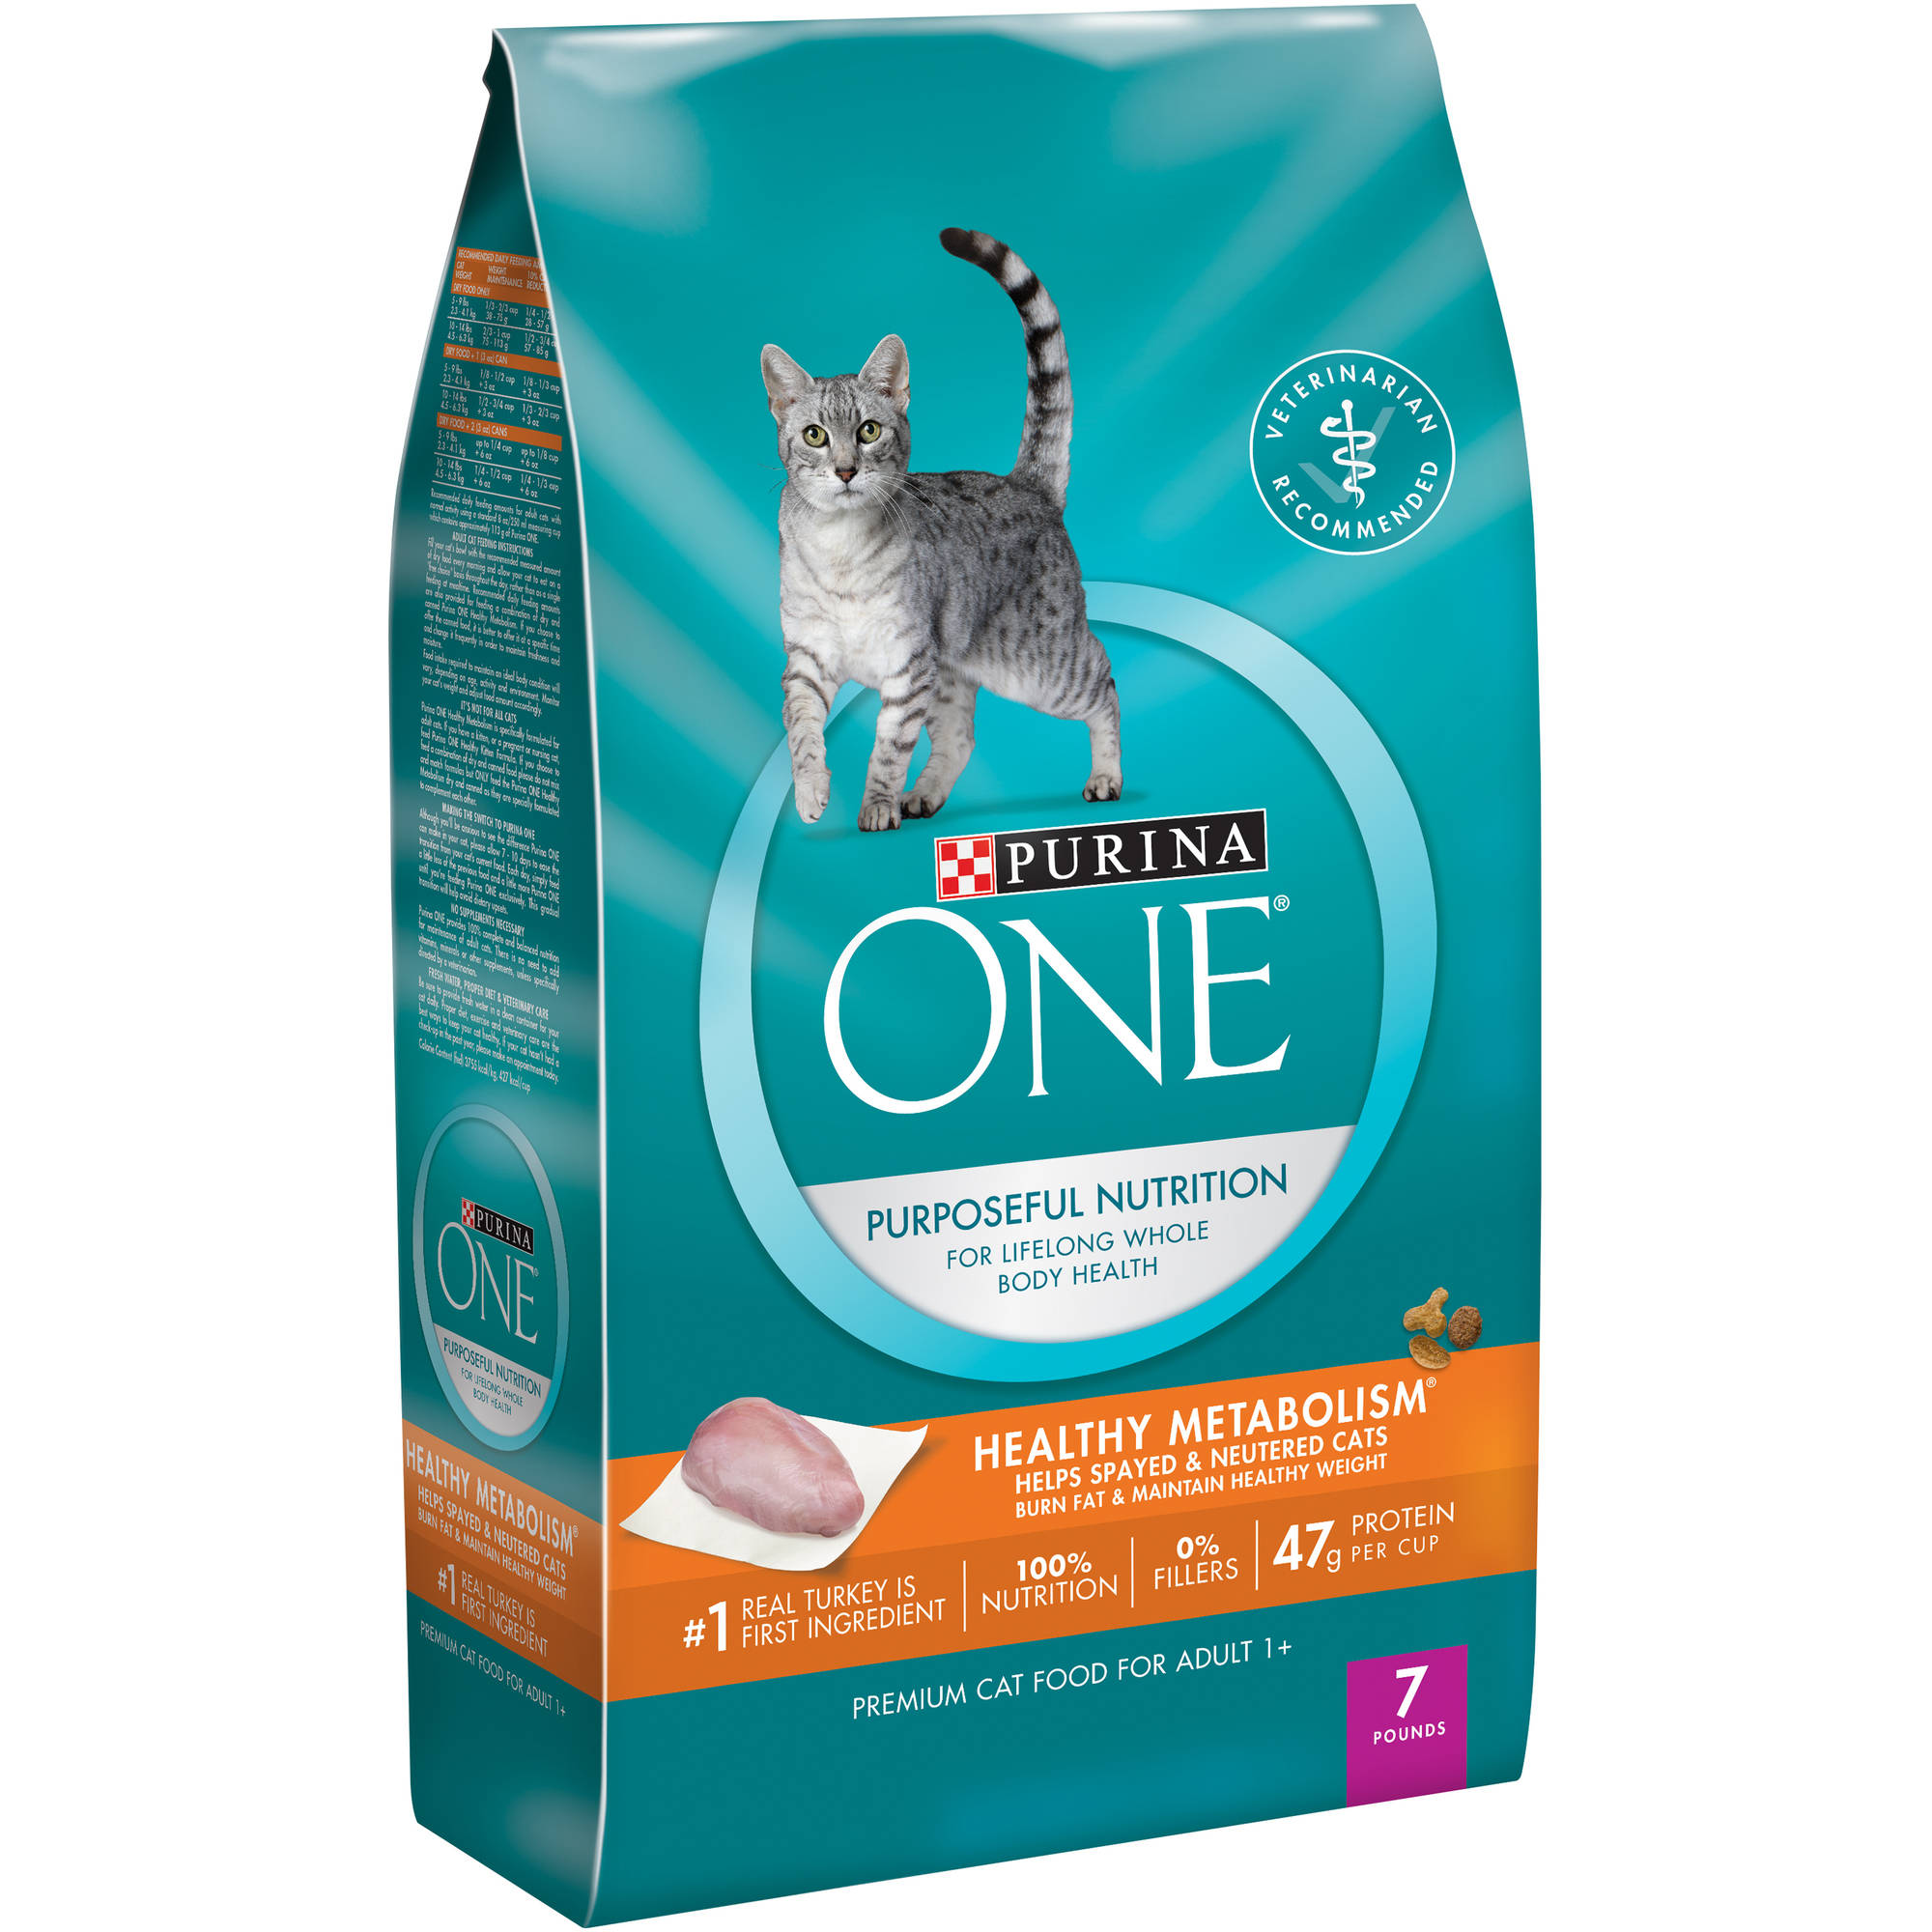 Purina ONE Healthy Metabolism Adult Premium Cat Food 7 lb. Bag